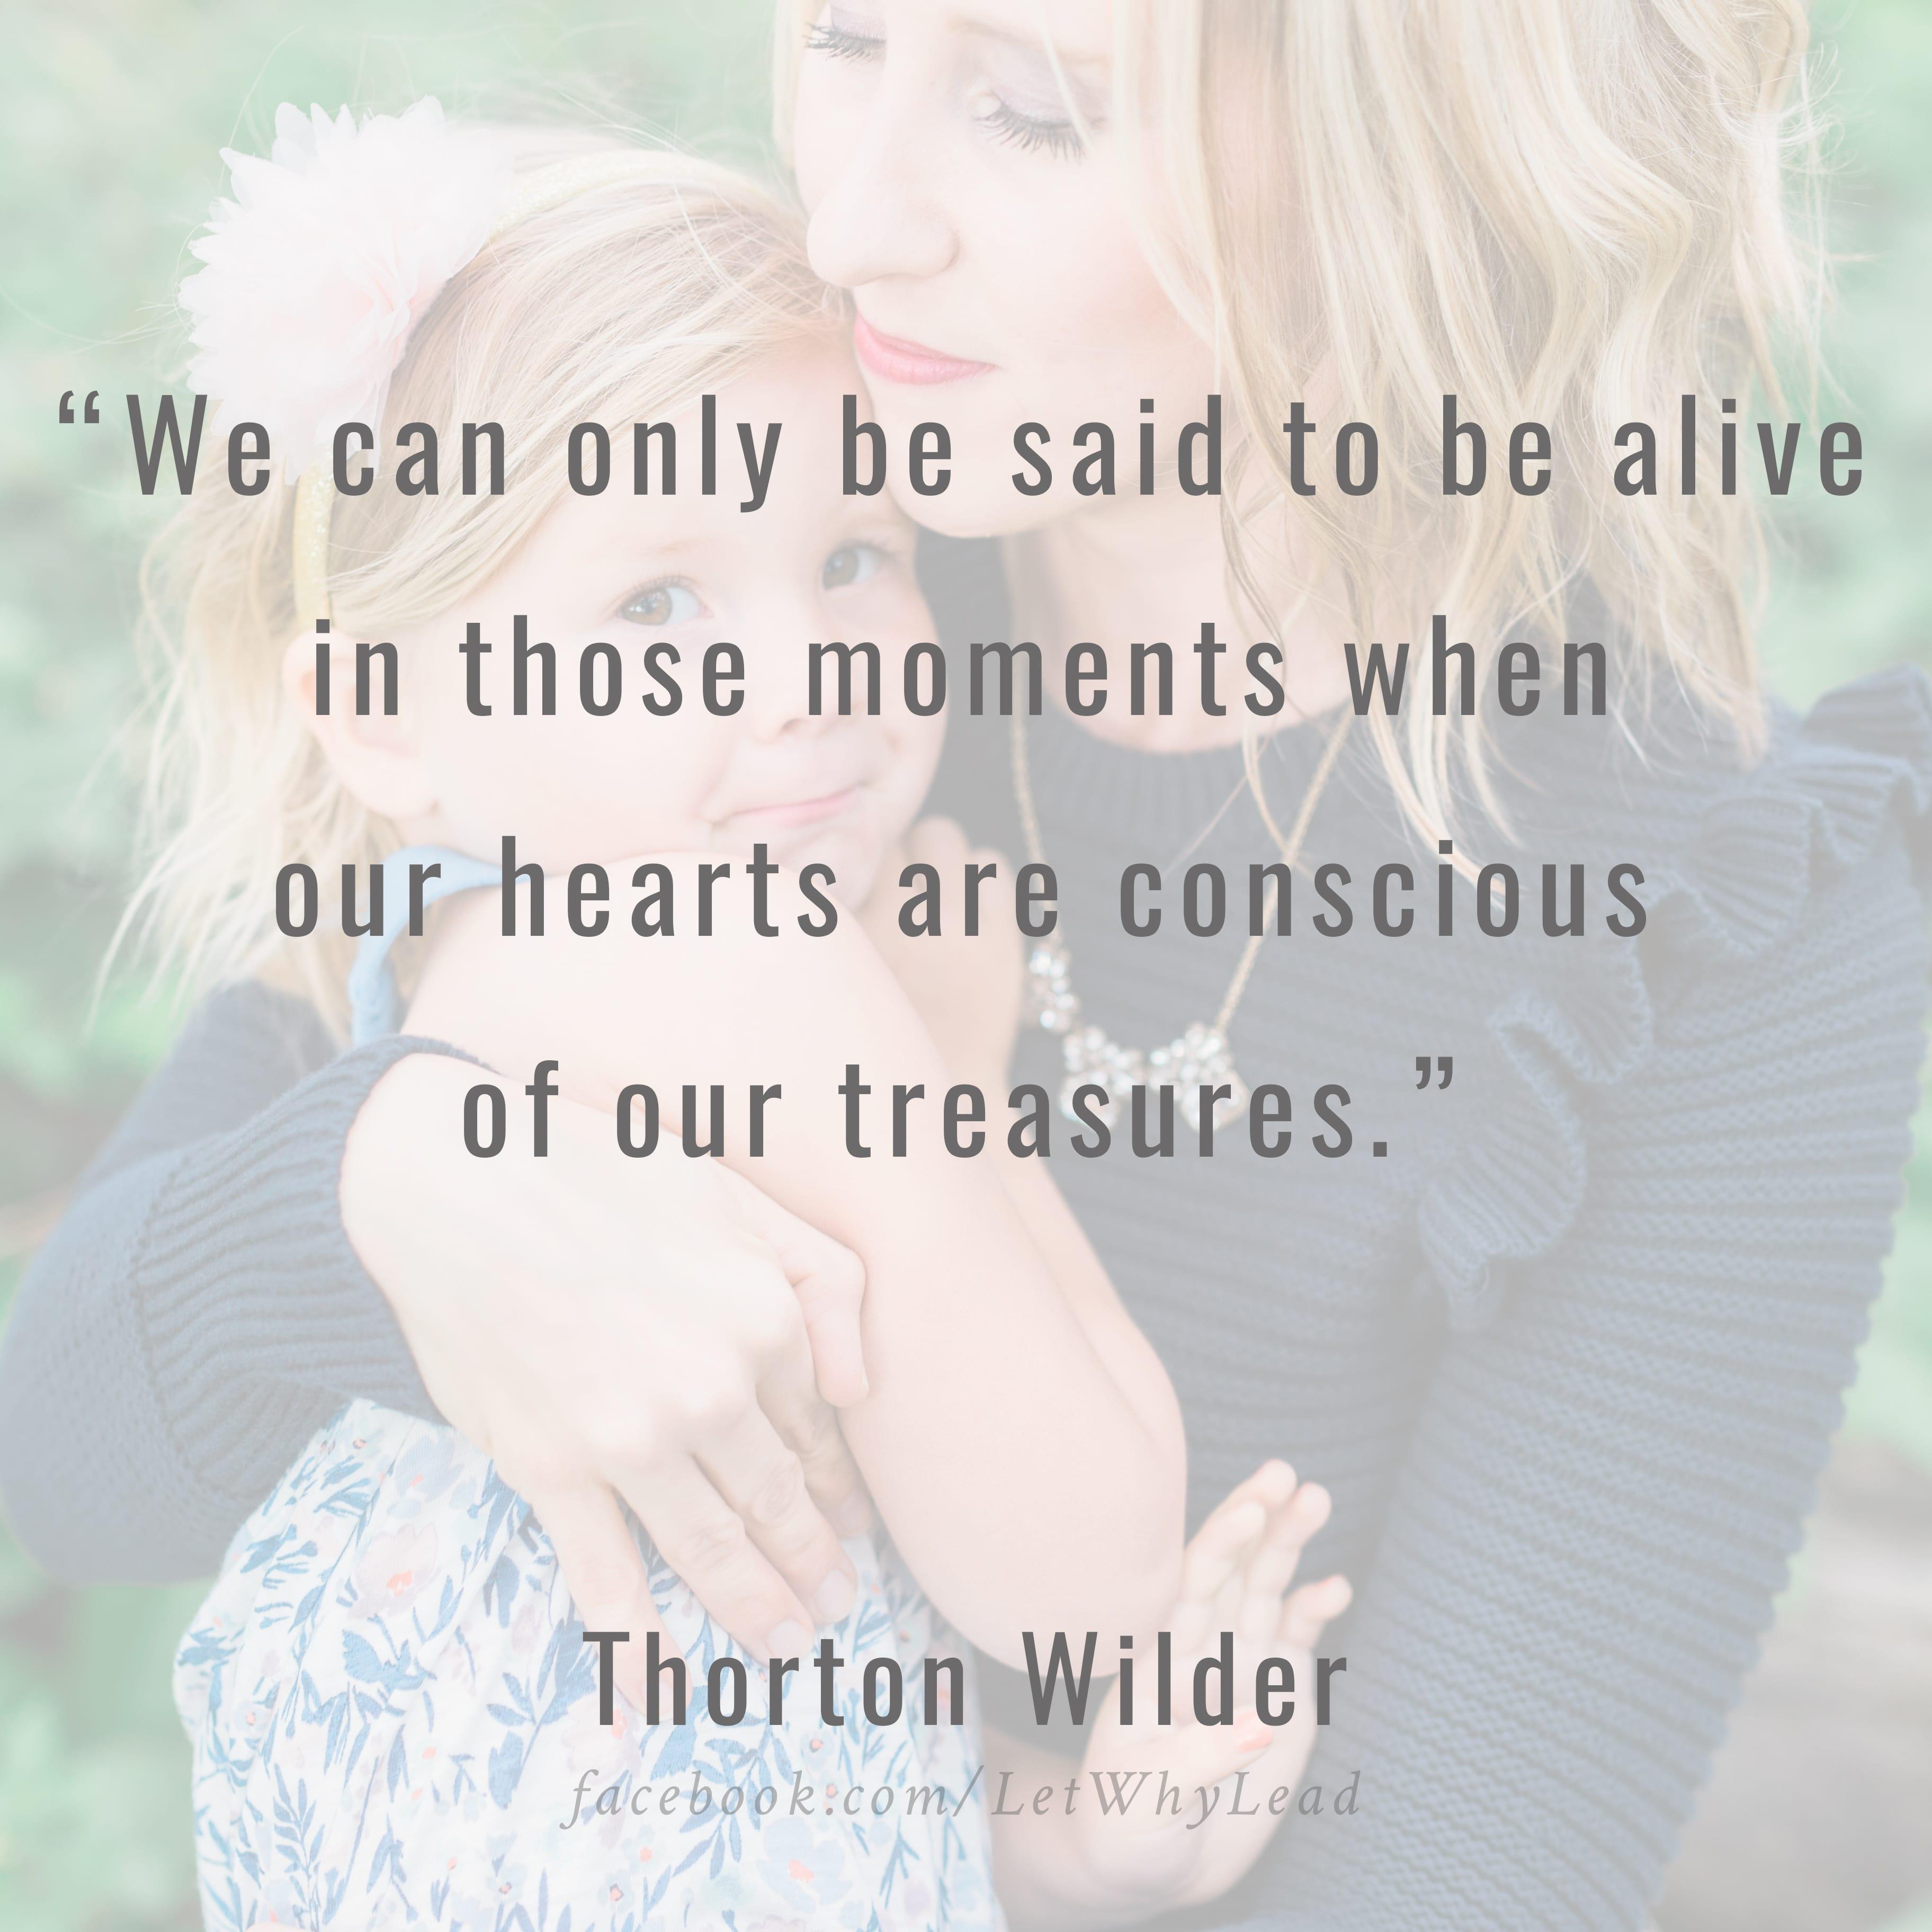 Hearts Conscious of Our Treasures Thorton Wilder